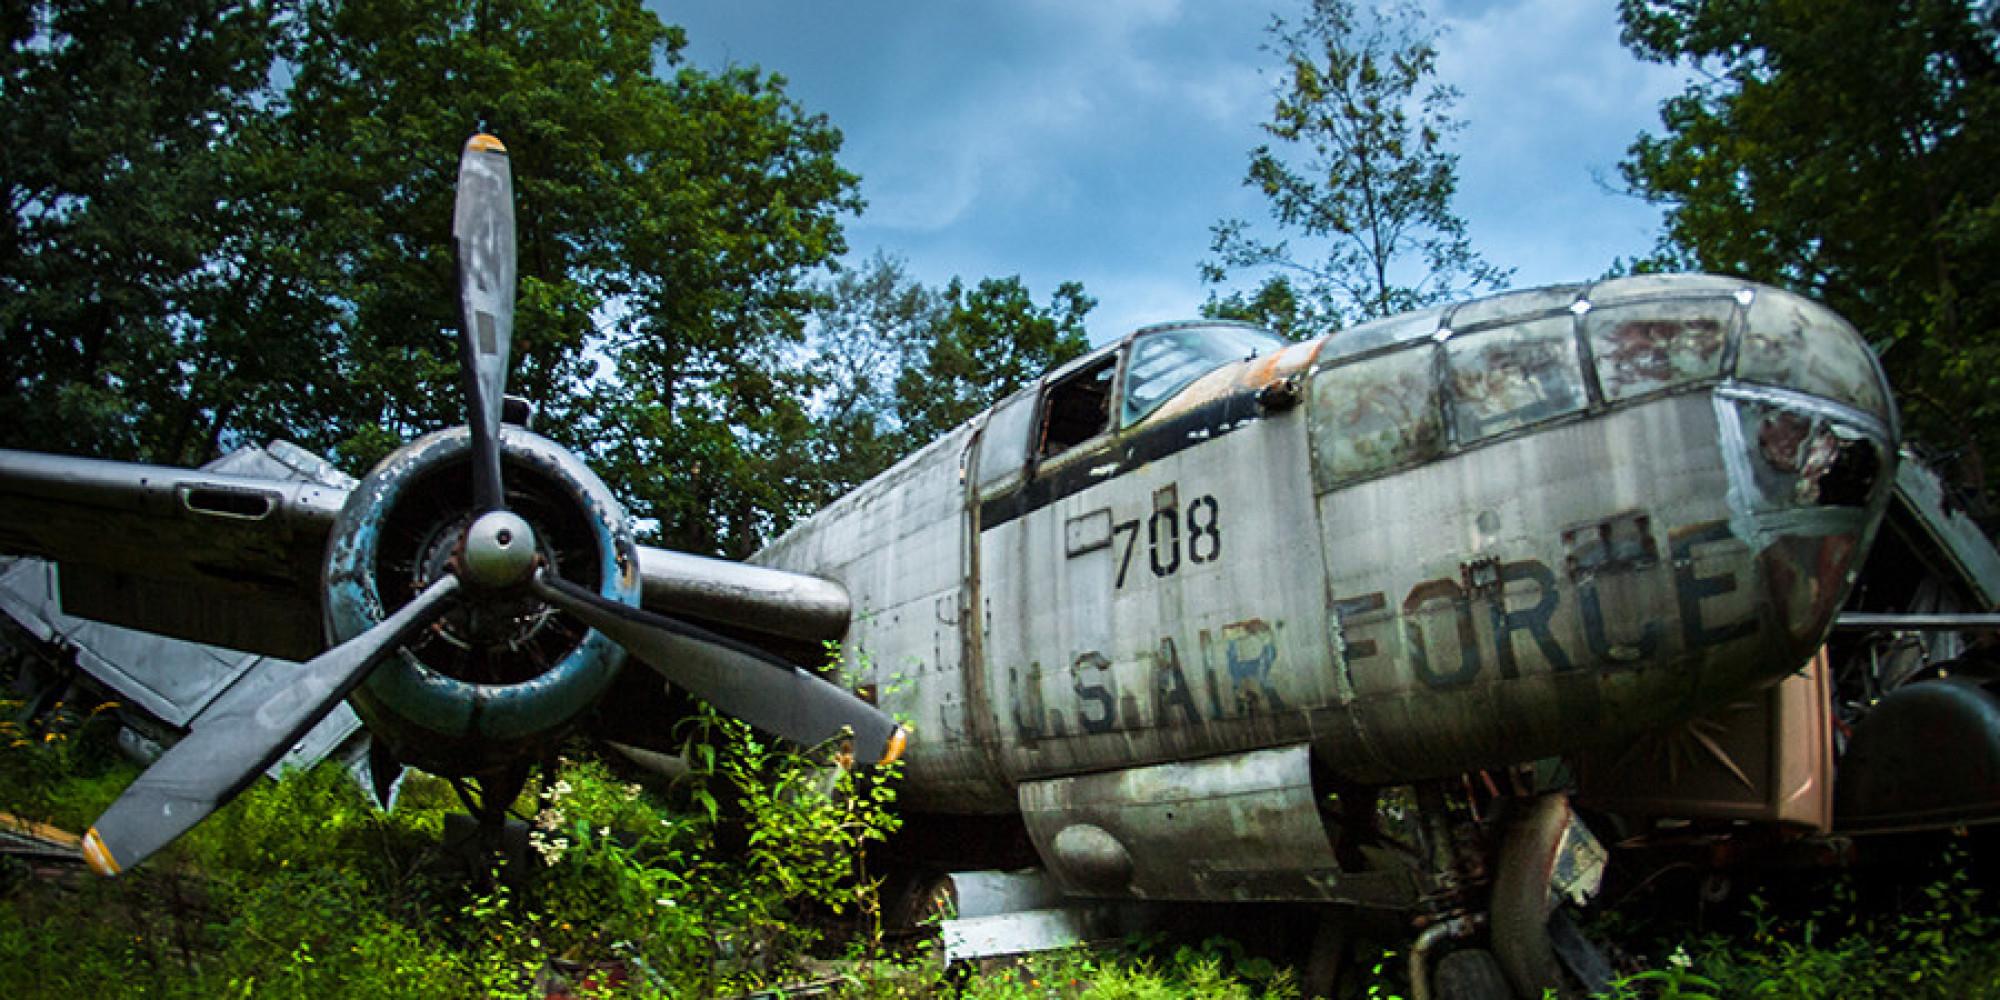 This Secret Warplane Graveyard Has A Great American Story Behind It ...